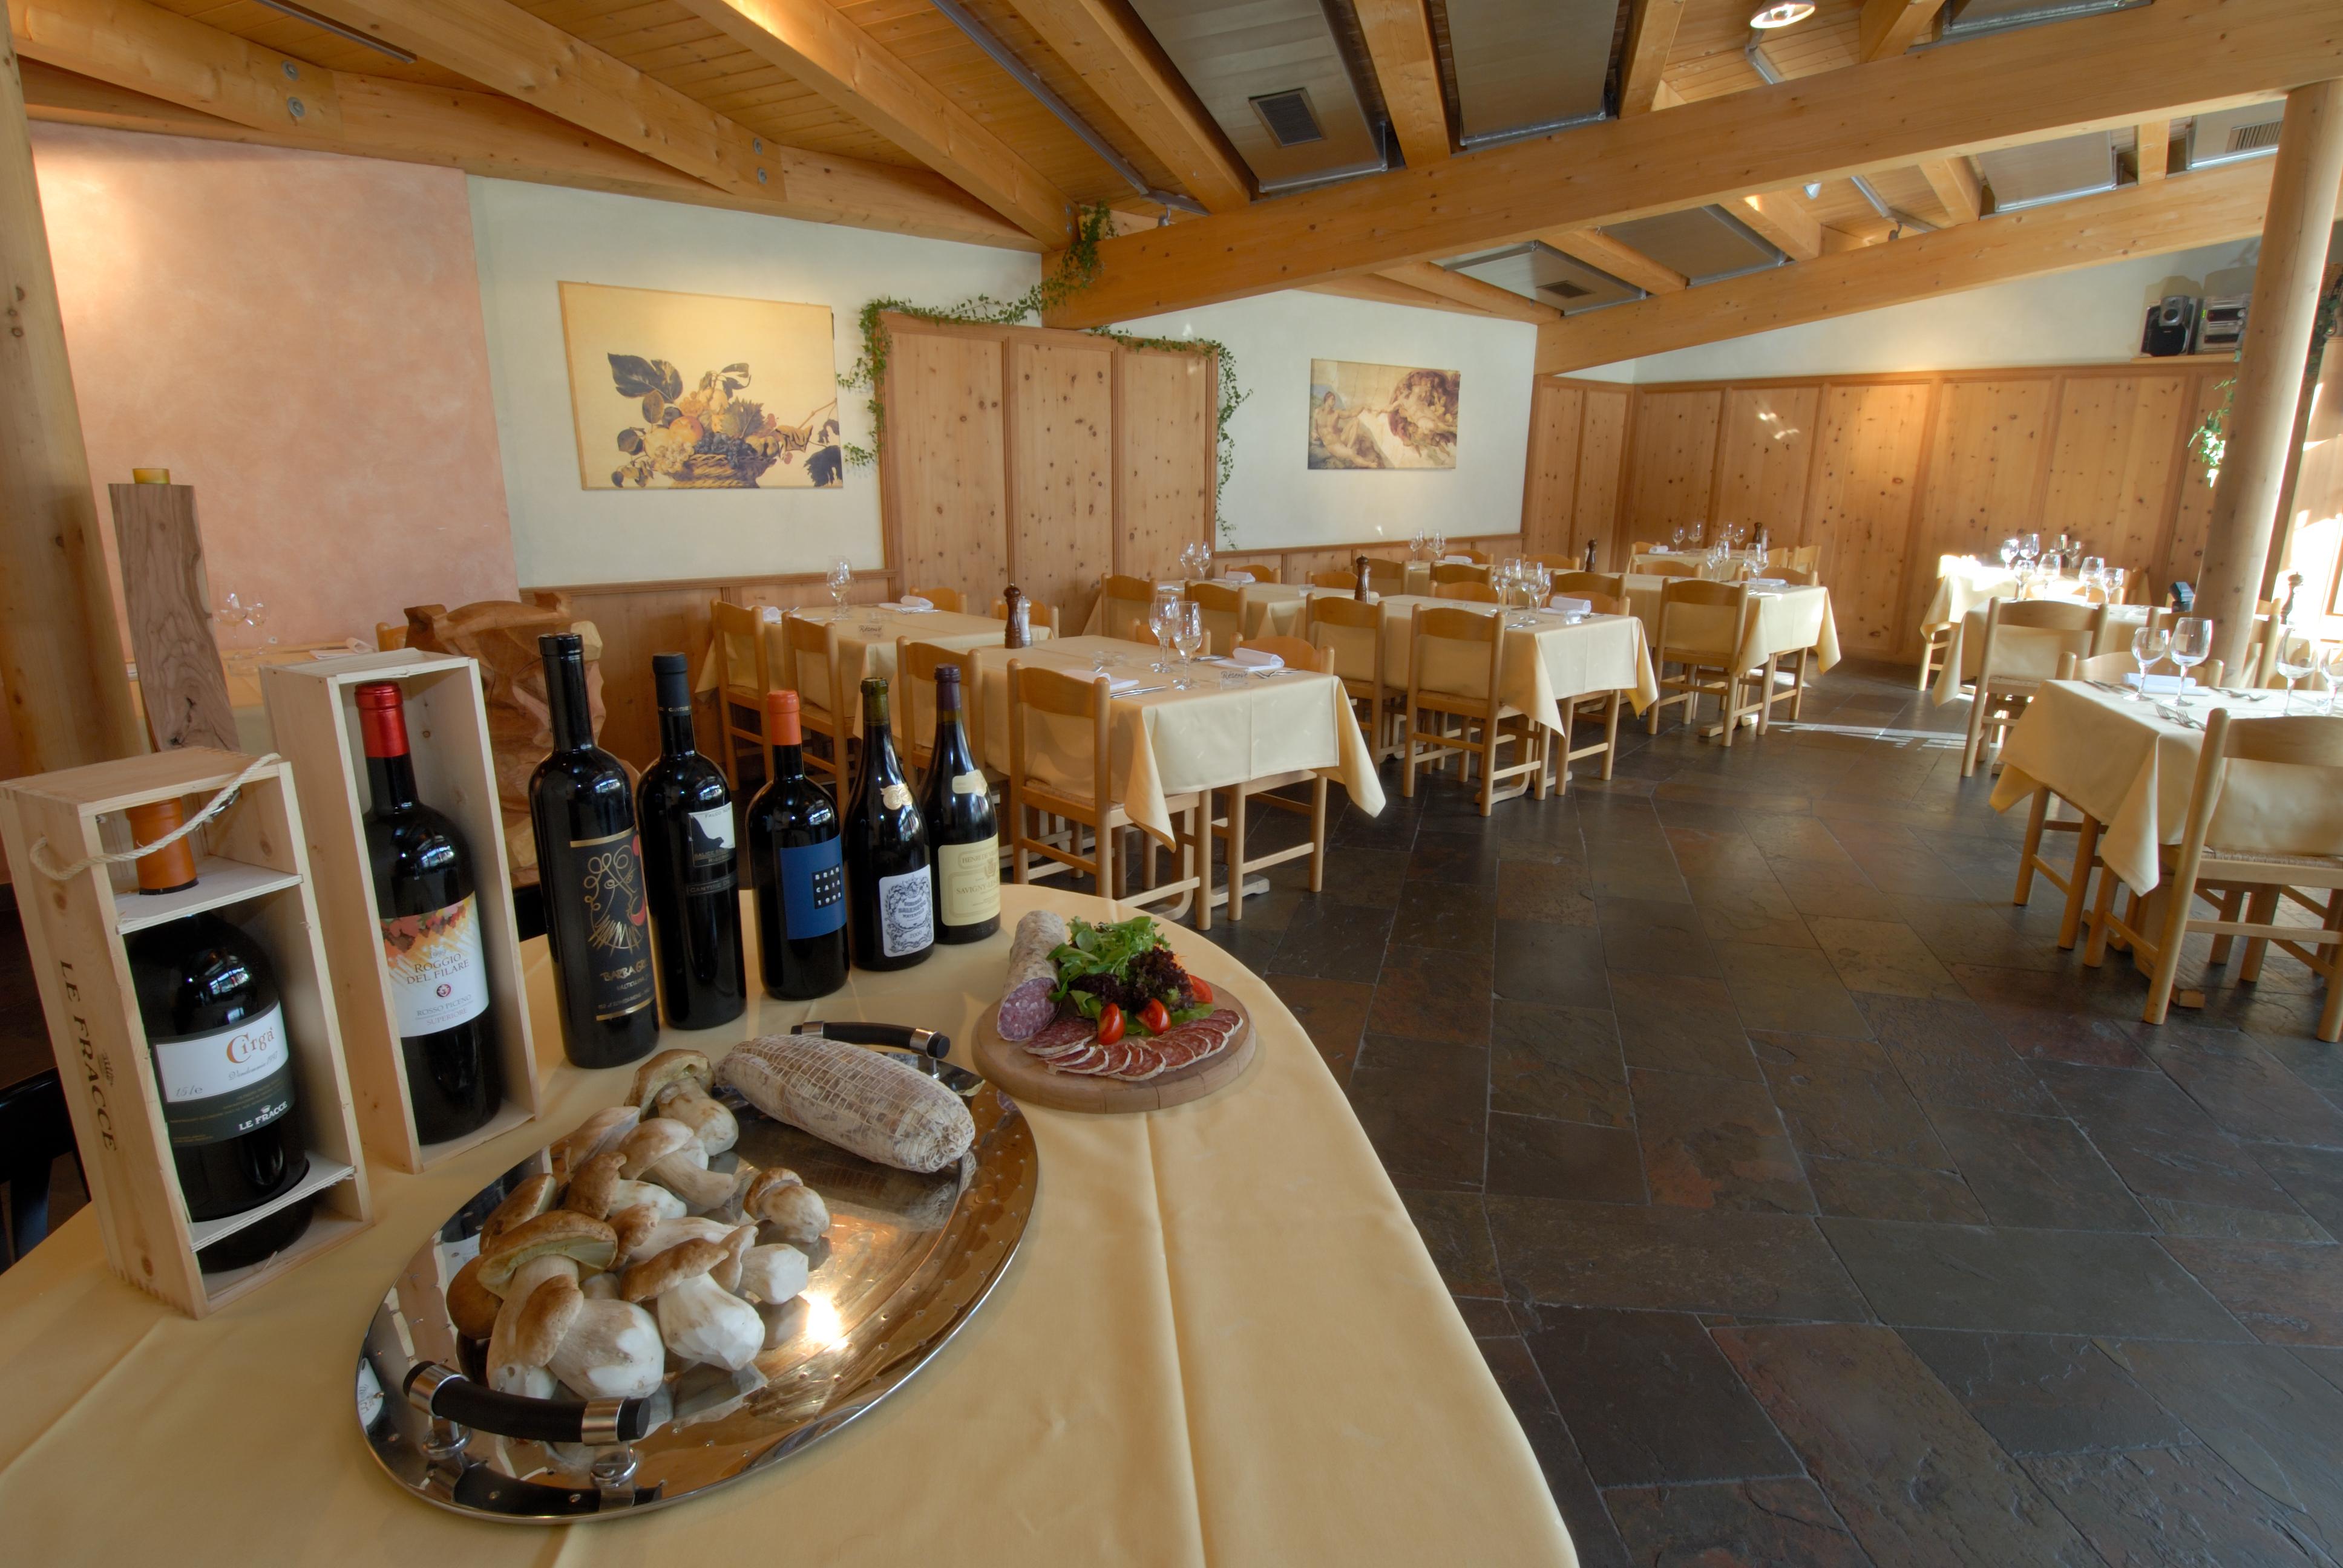 Restorant La Piruetta Slide 1